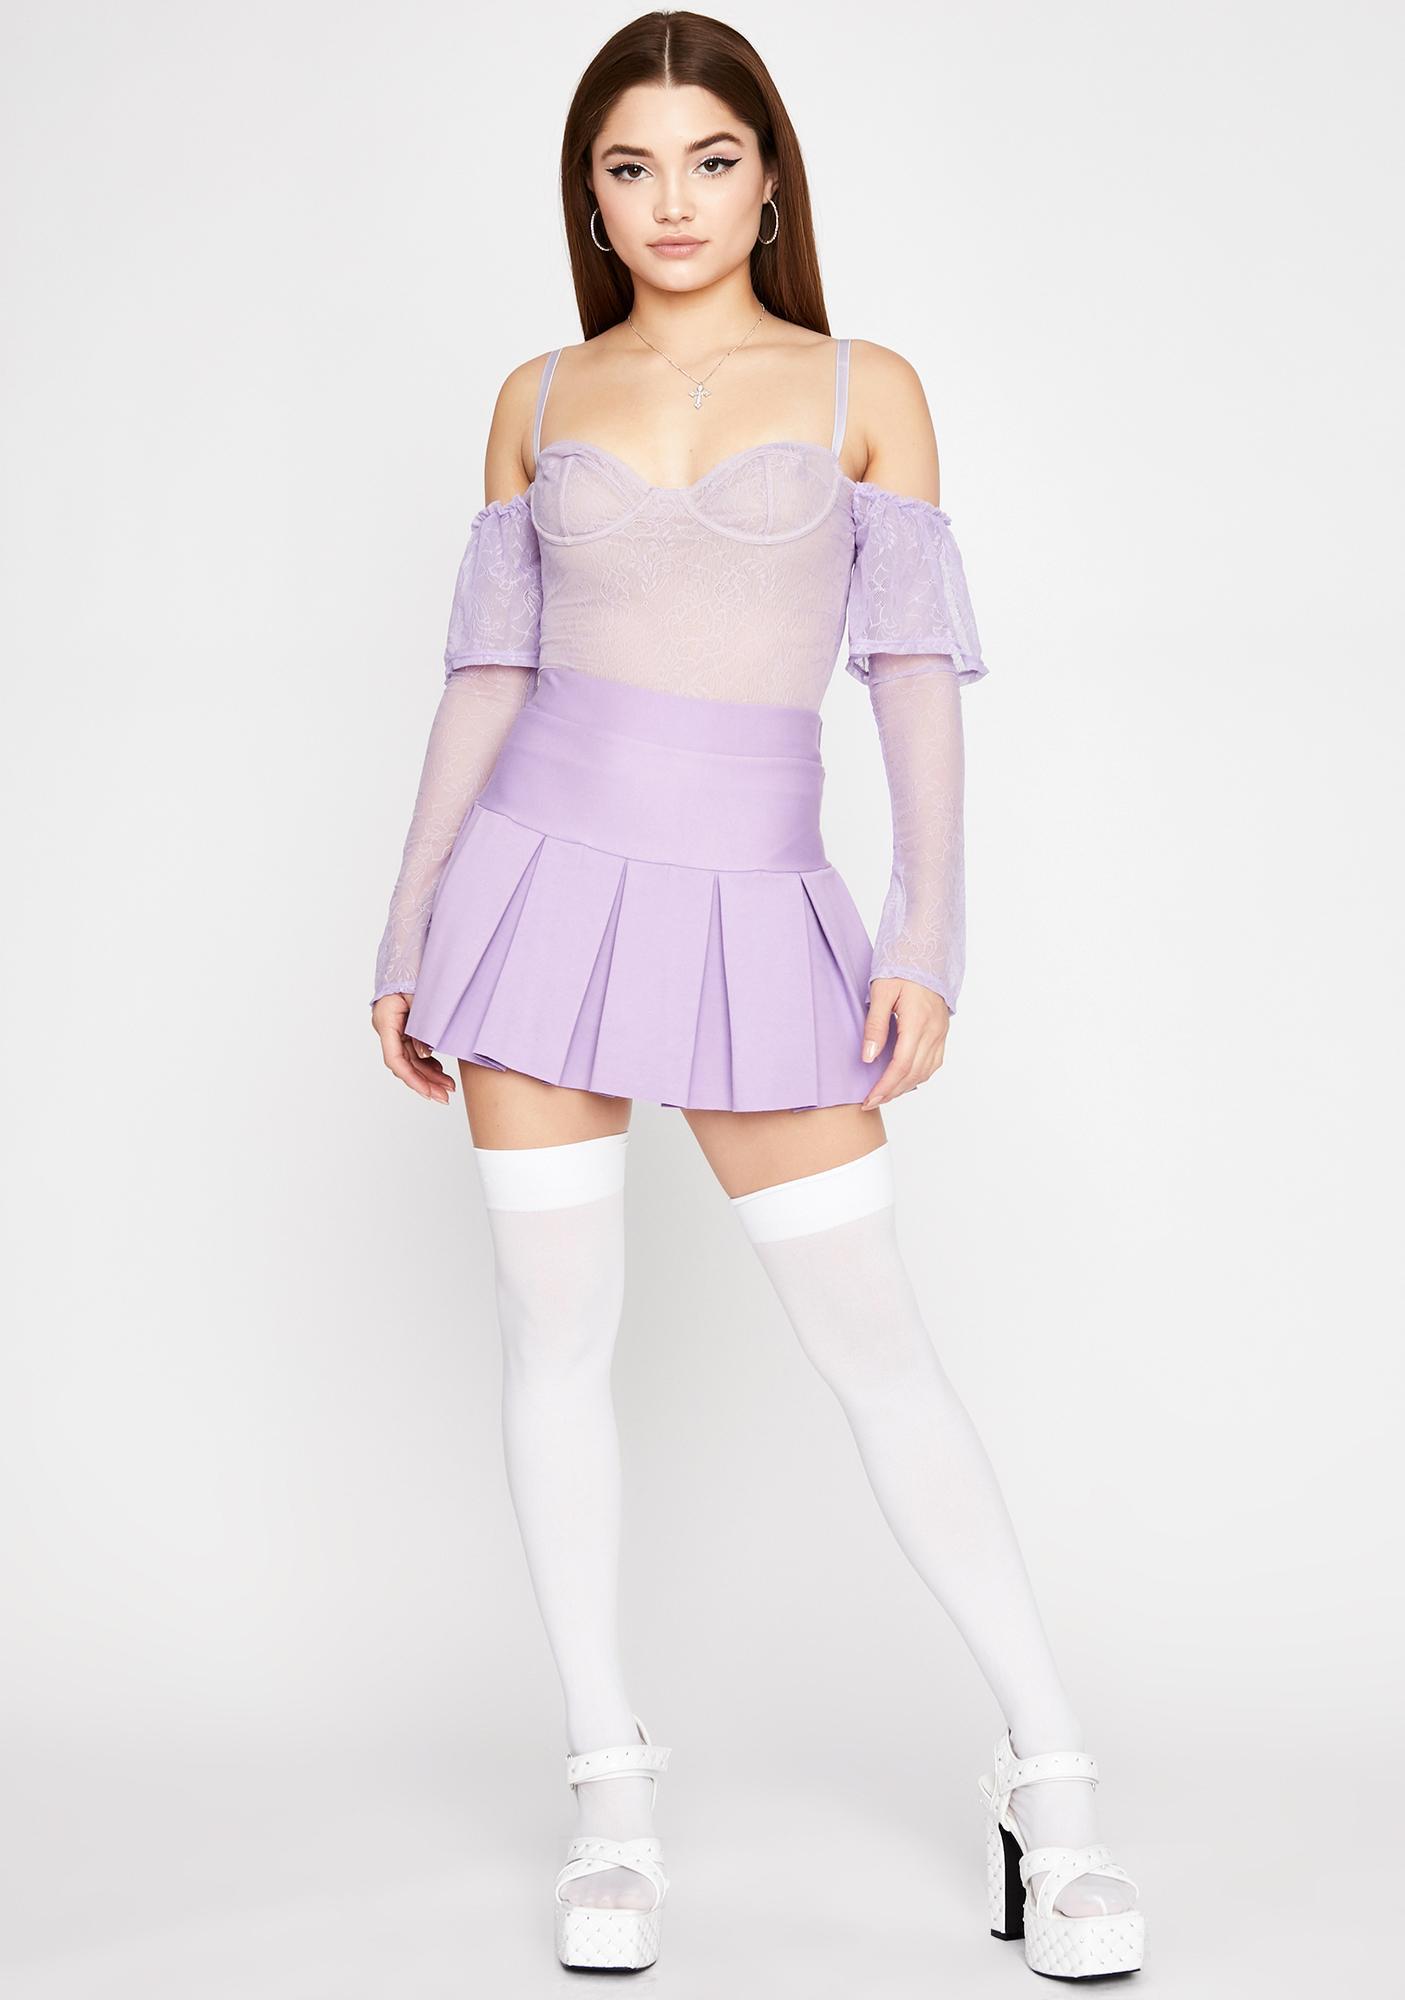 Lilac Freaky Flirt Lace Bodysuit